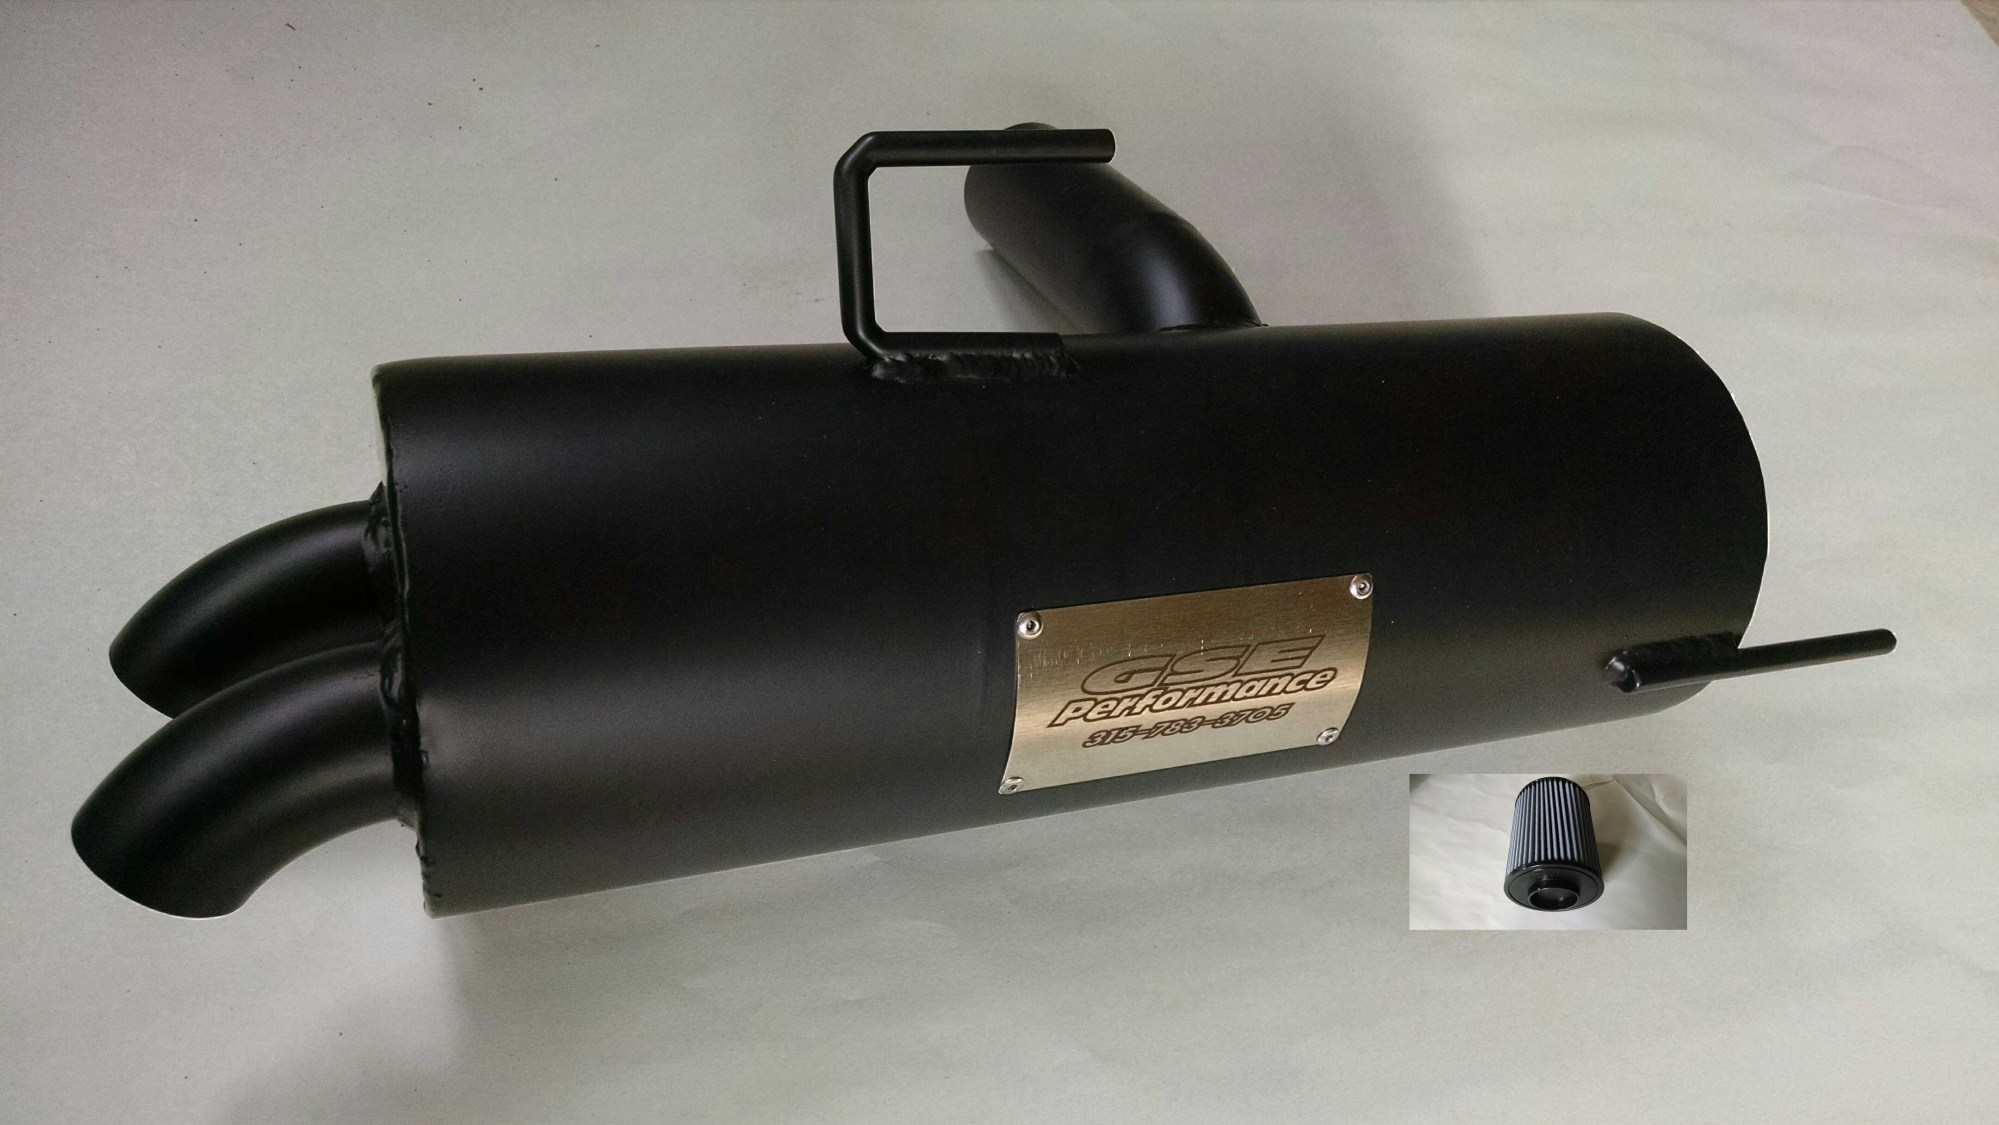 hight resolution of polaris rzr 800 trail tamer muffler high flow air filter gse